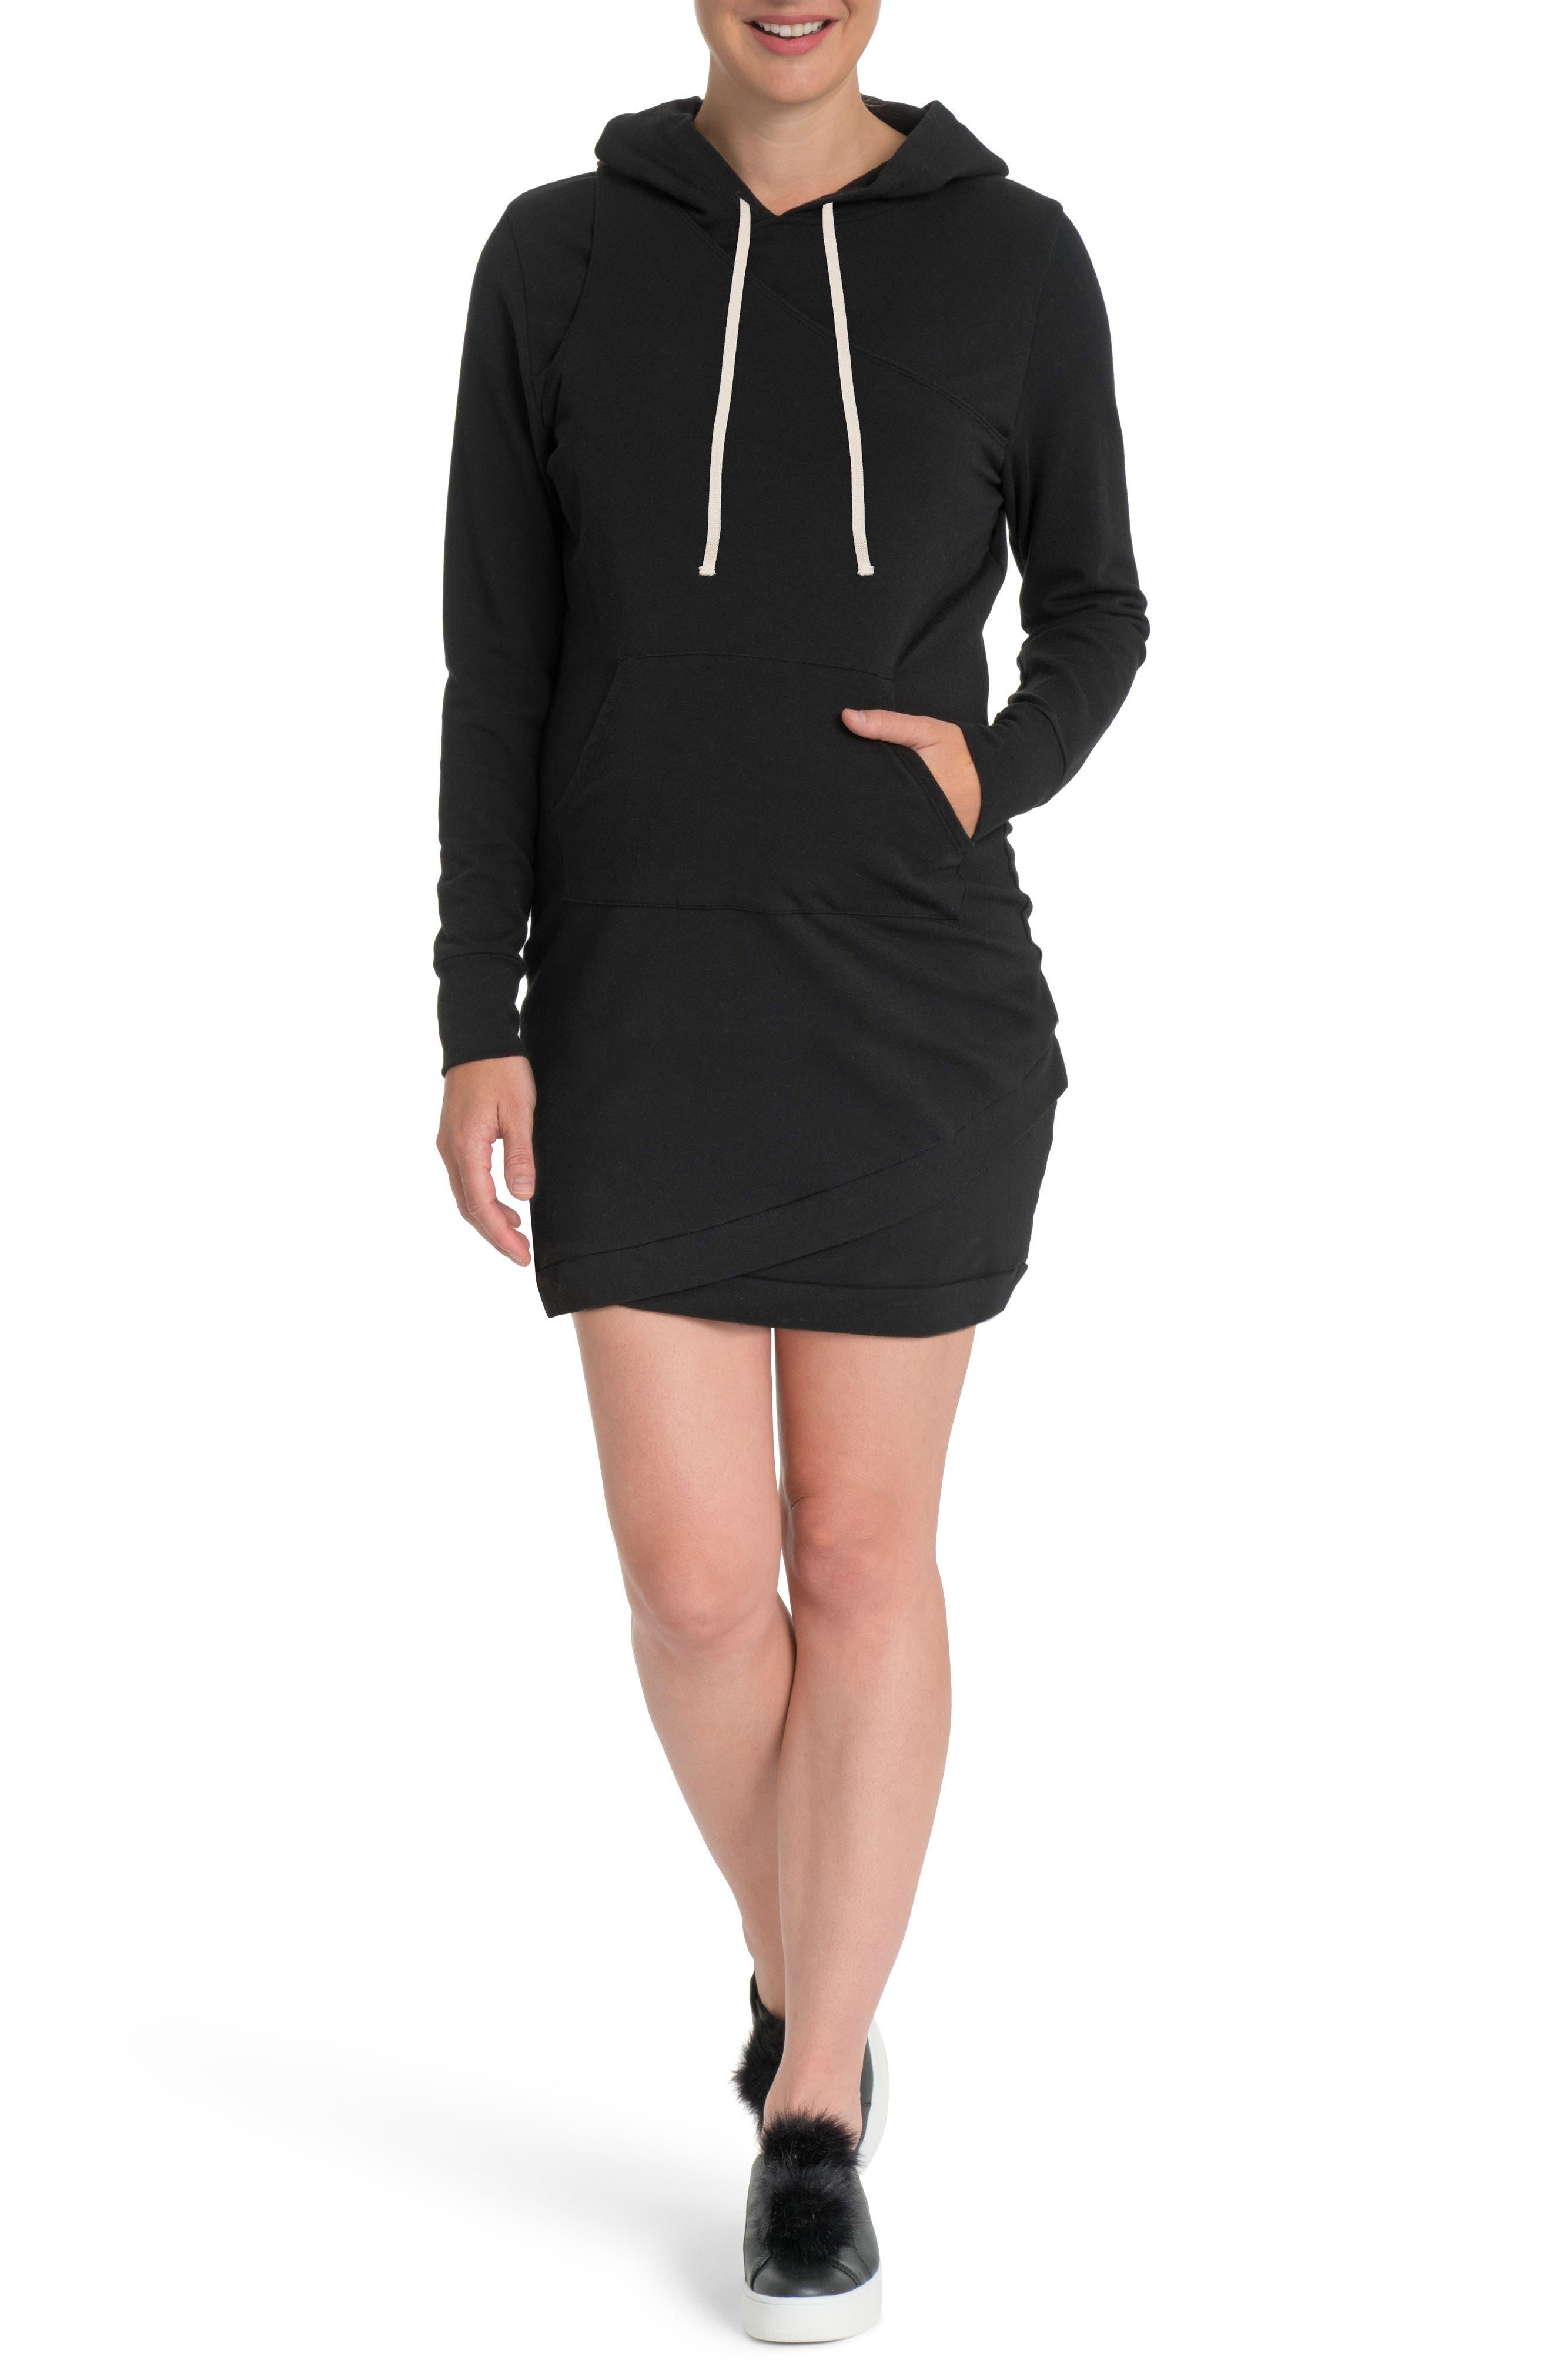 Bun Maternity Cozy Maternity/Nursing Hooded Dress